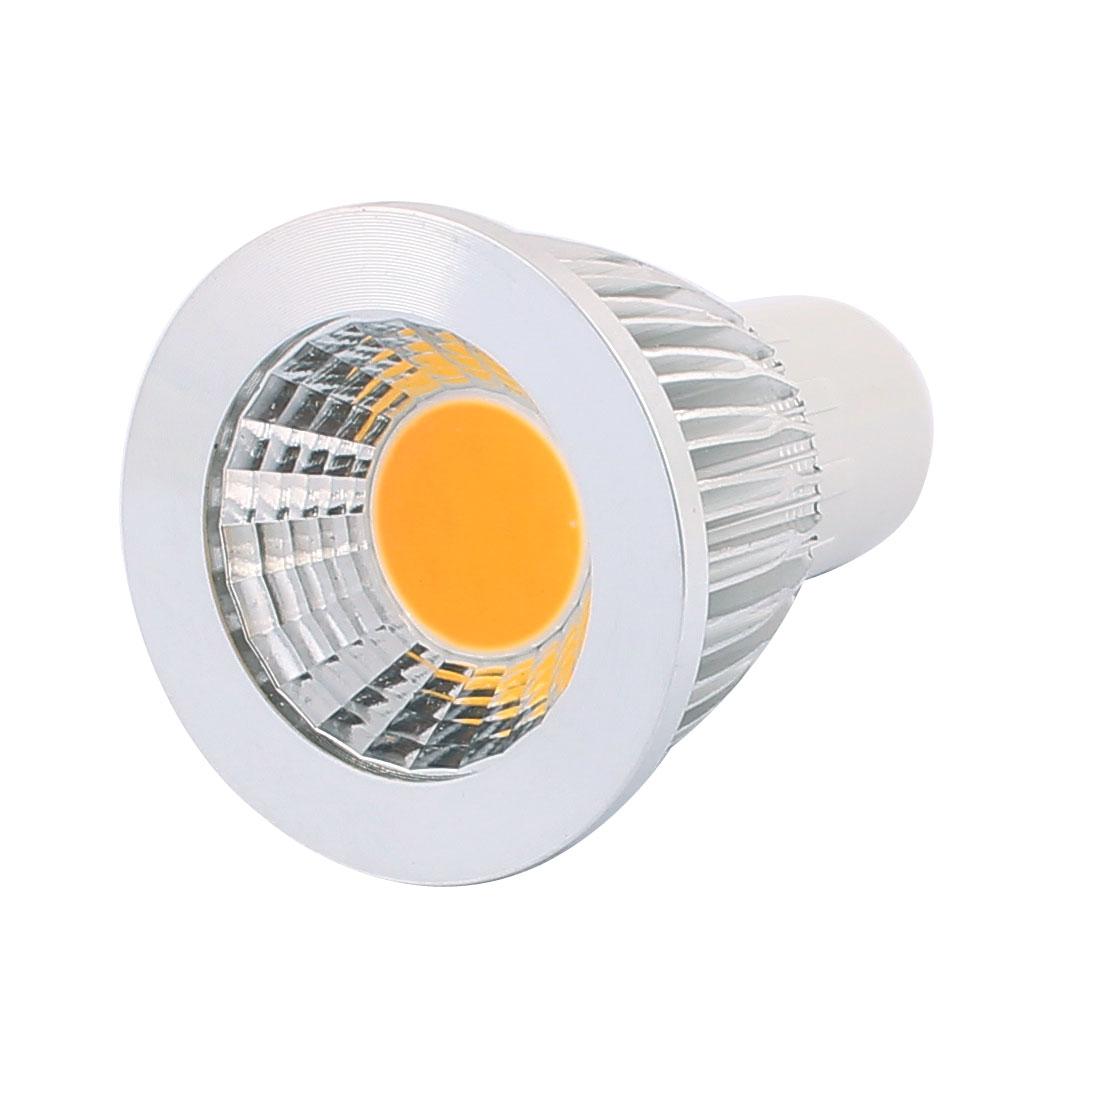 AC85-265V 5W Bright GU5.3 COB LED Spot Down Light Lamp Energy Saving Warm White